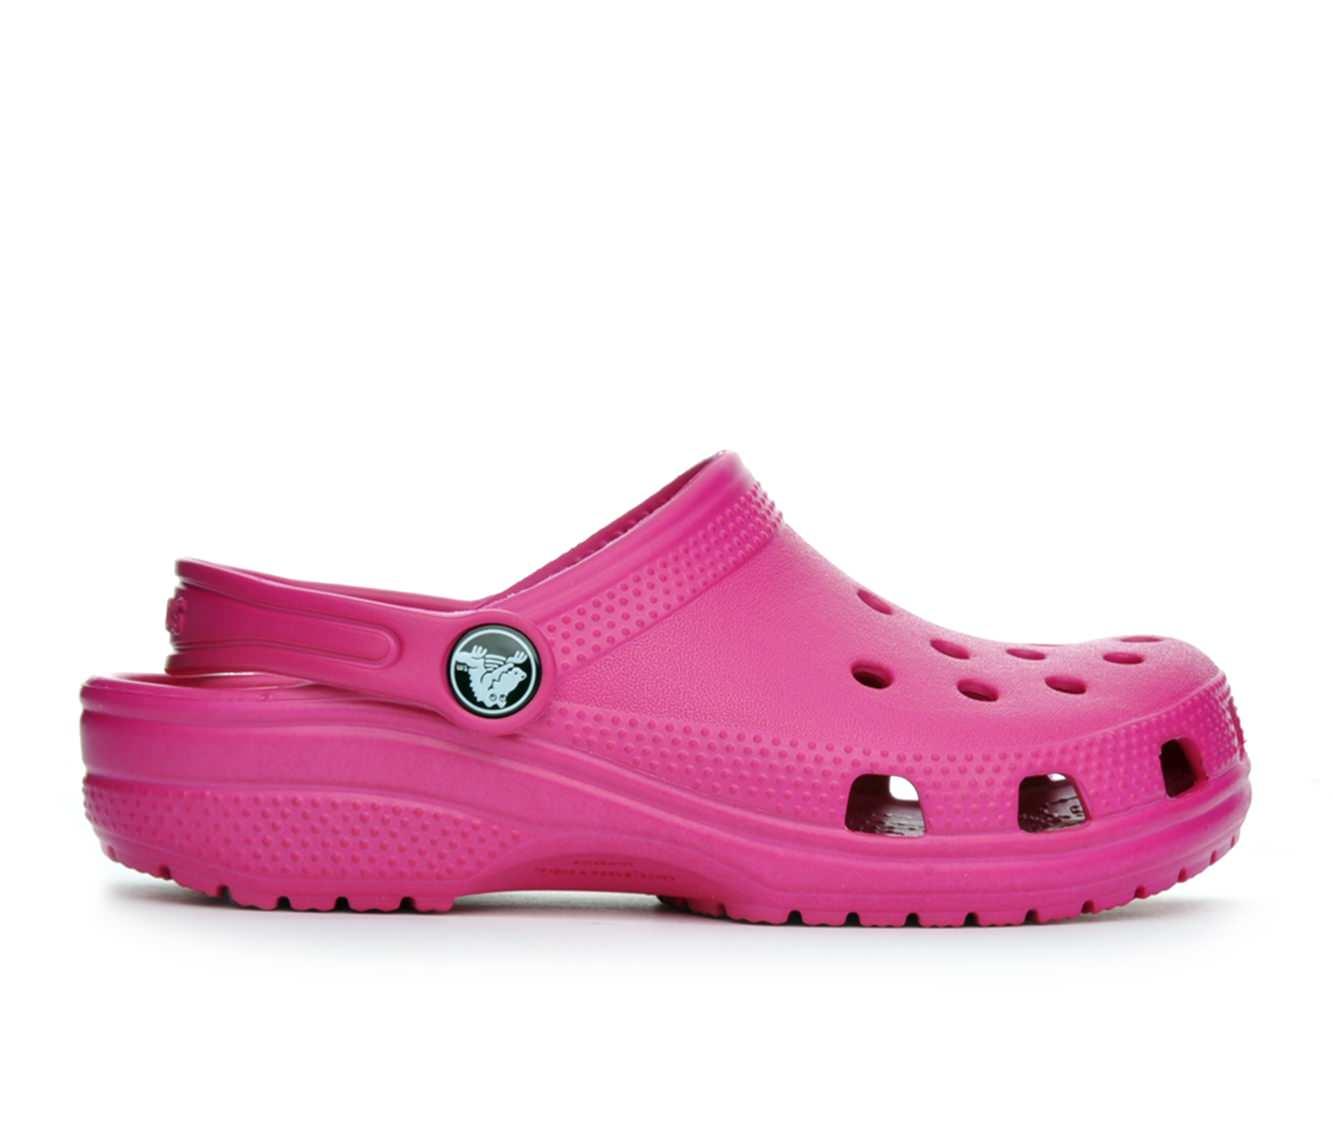 Girls' Crocs Classic Clog Children's Shoes (Pink)